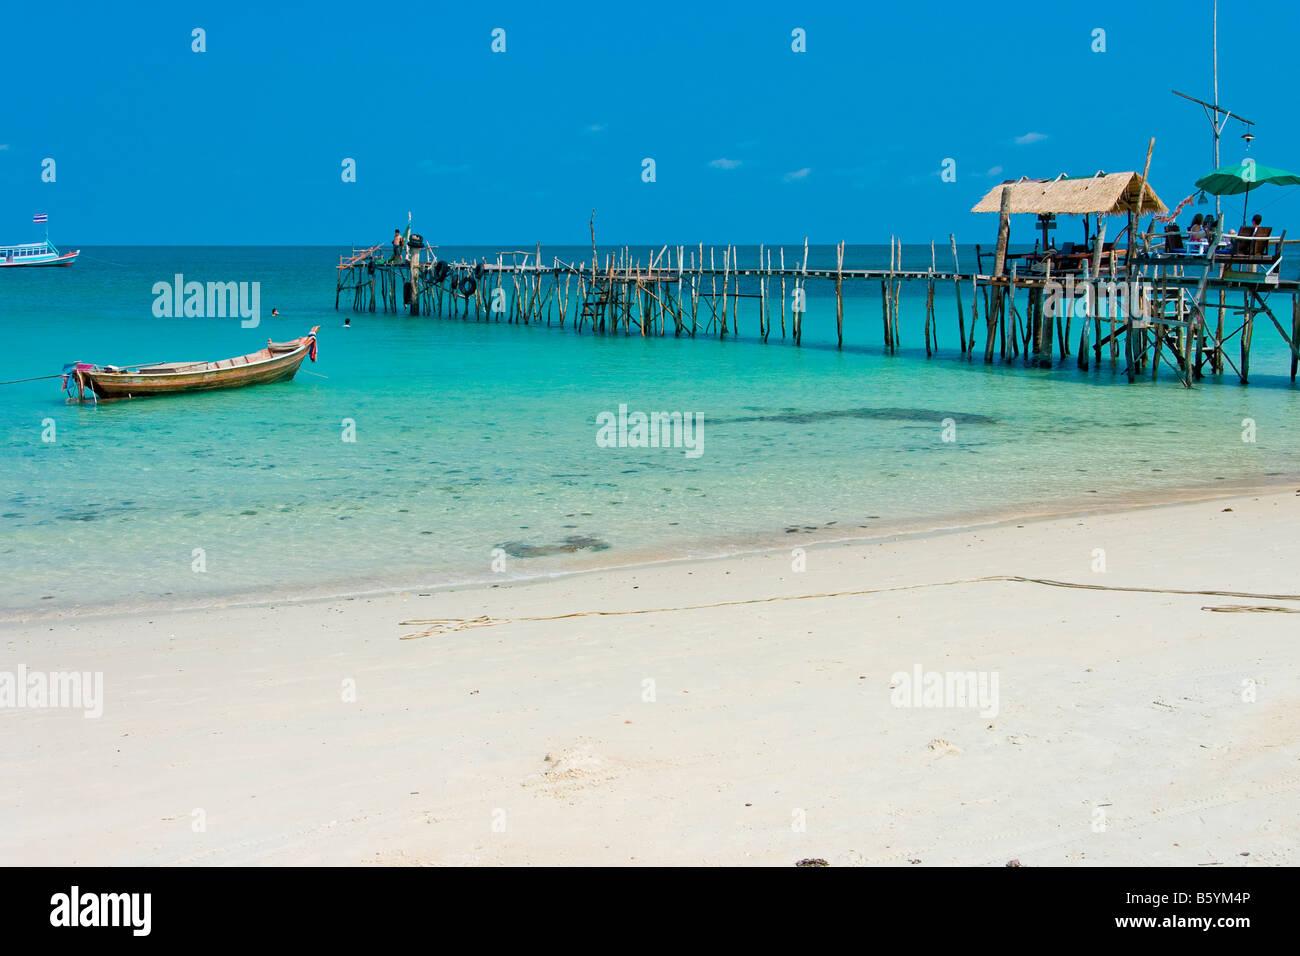 Koh Chang beach sand boat watterside - Stock Image